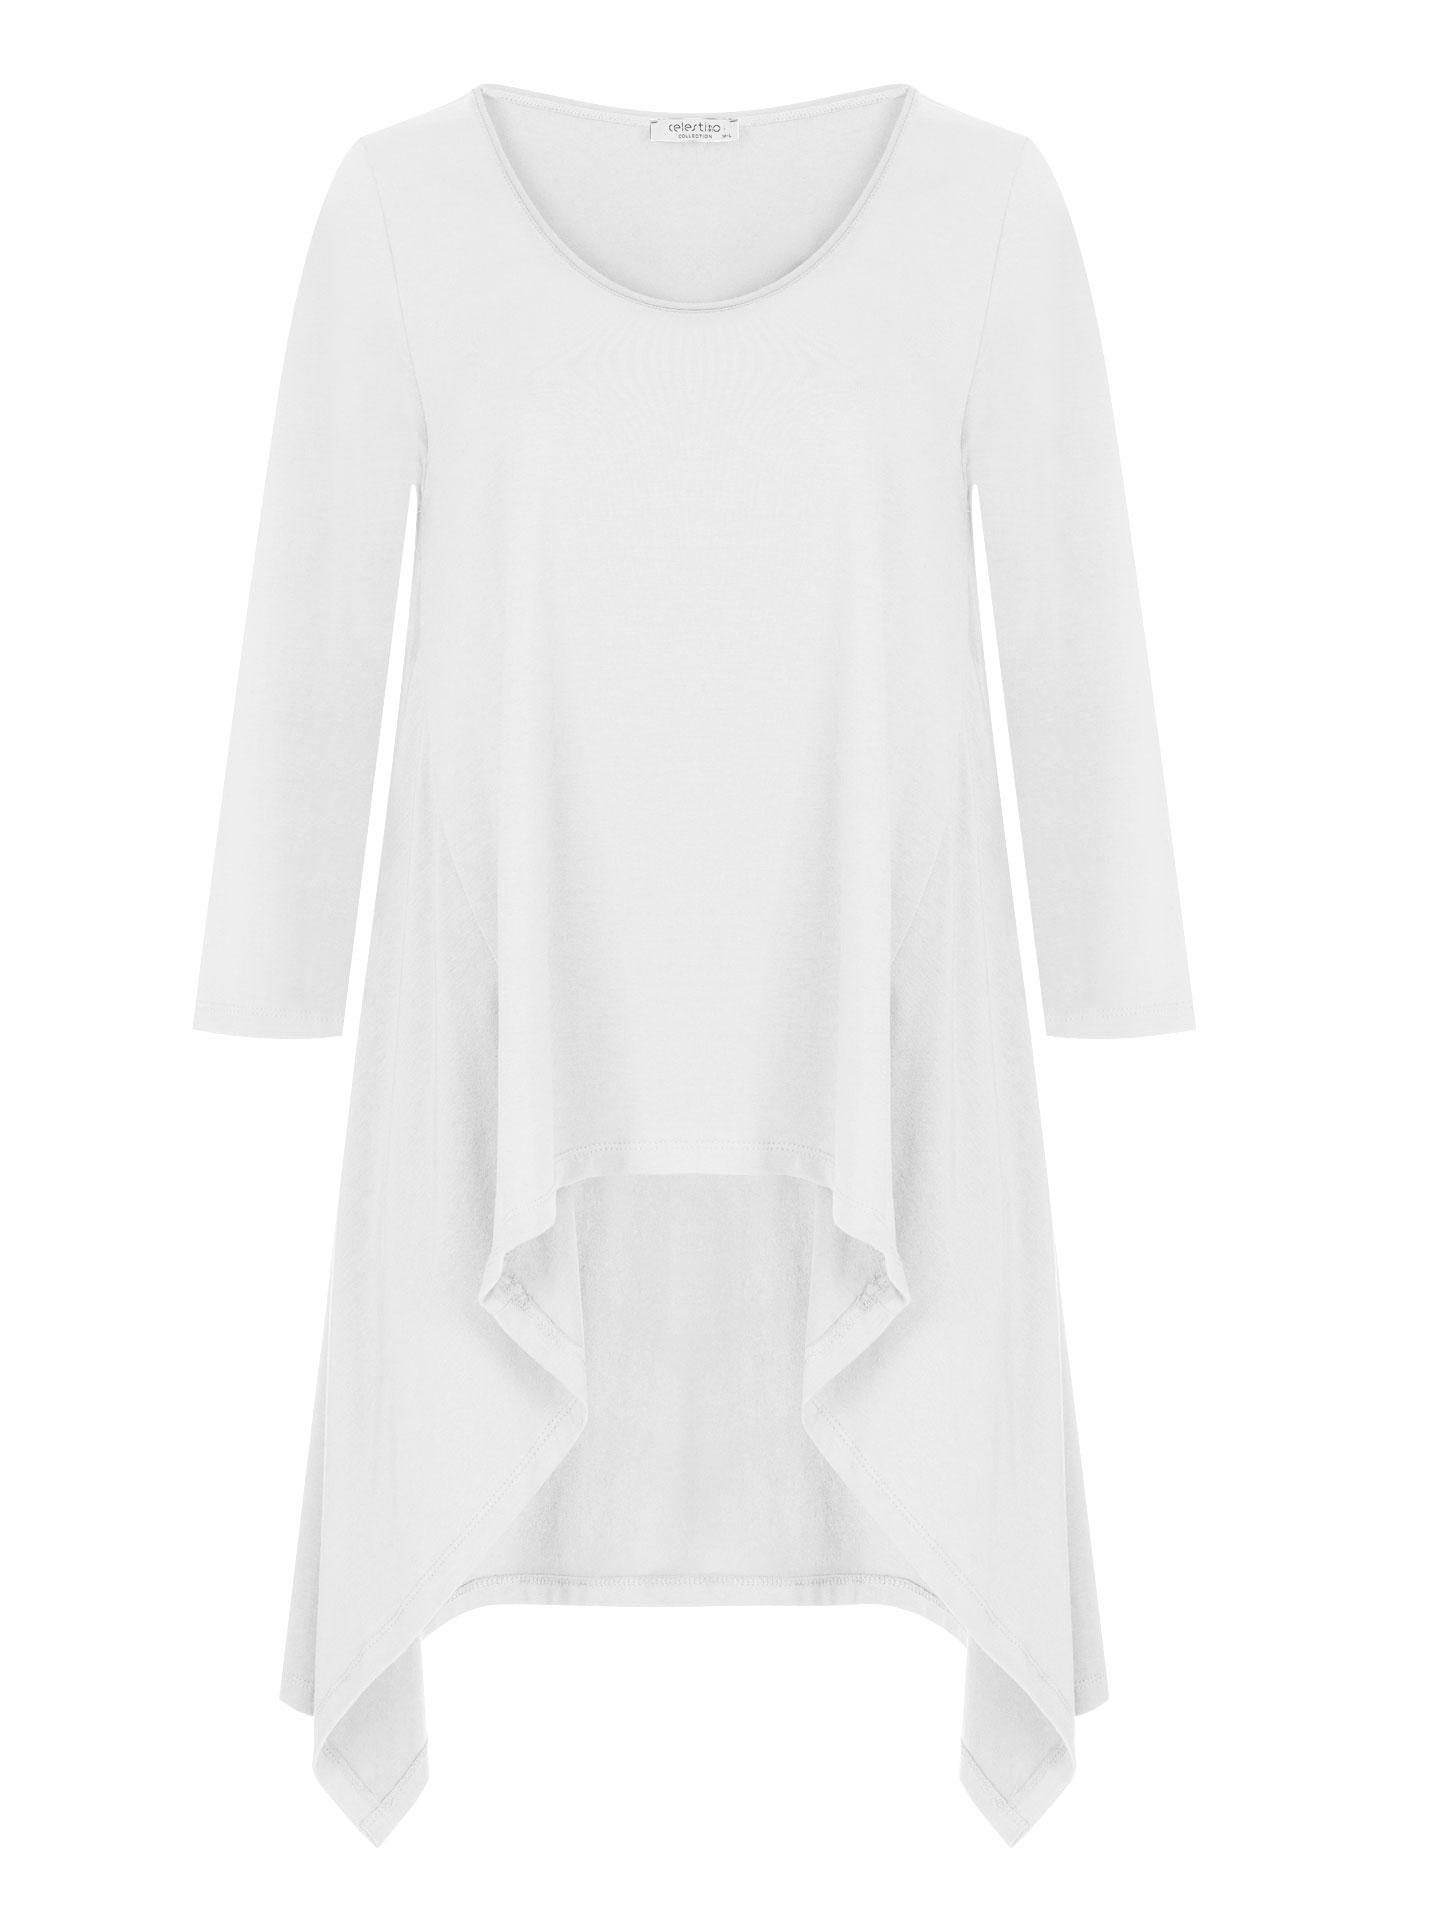 a1ffe795674f Oversized μπλούζα με απαλή υφή σε εκρου